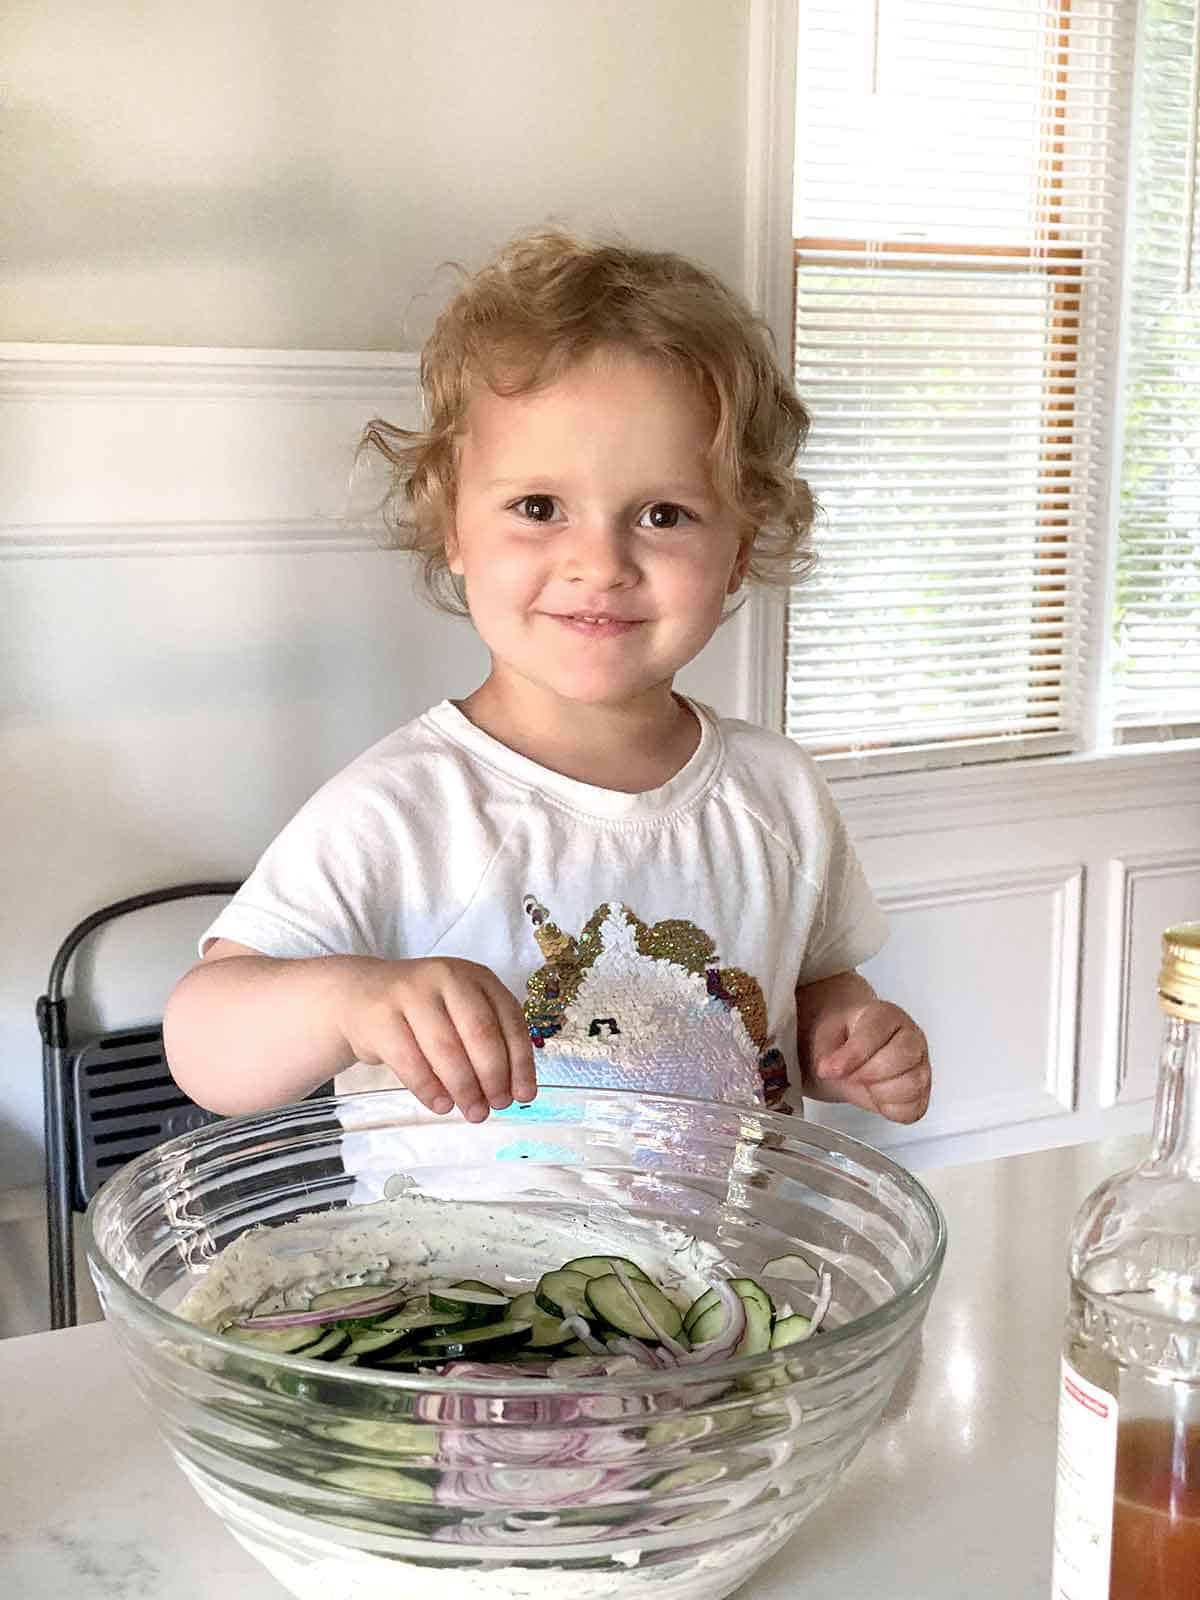 Three year old child helping make salad.